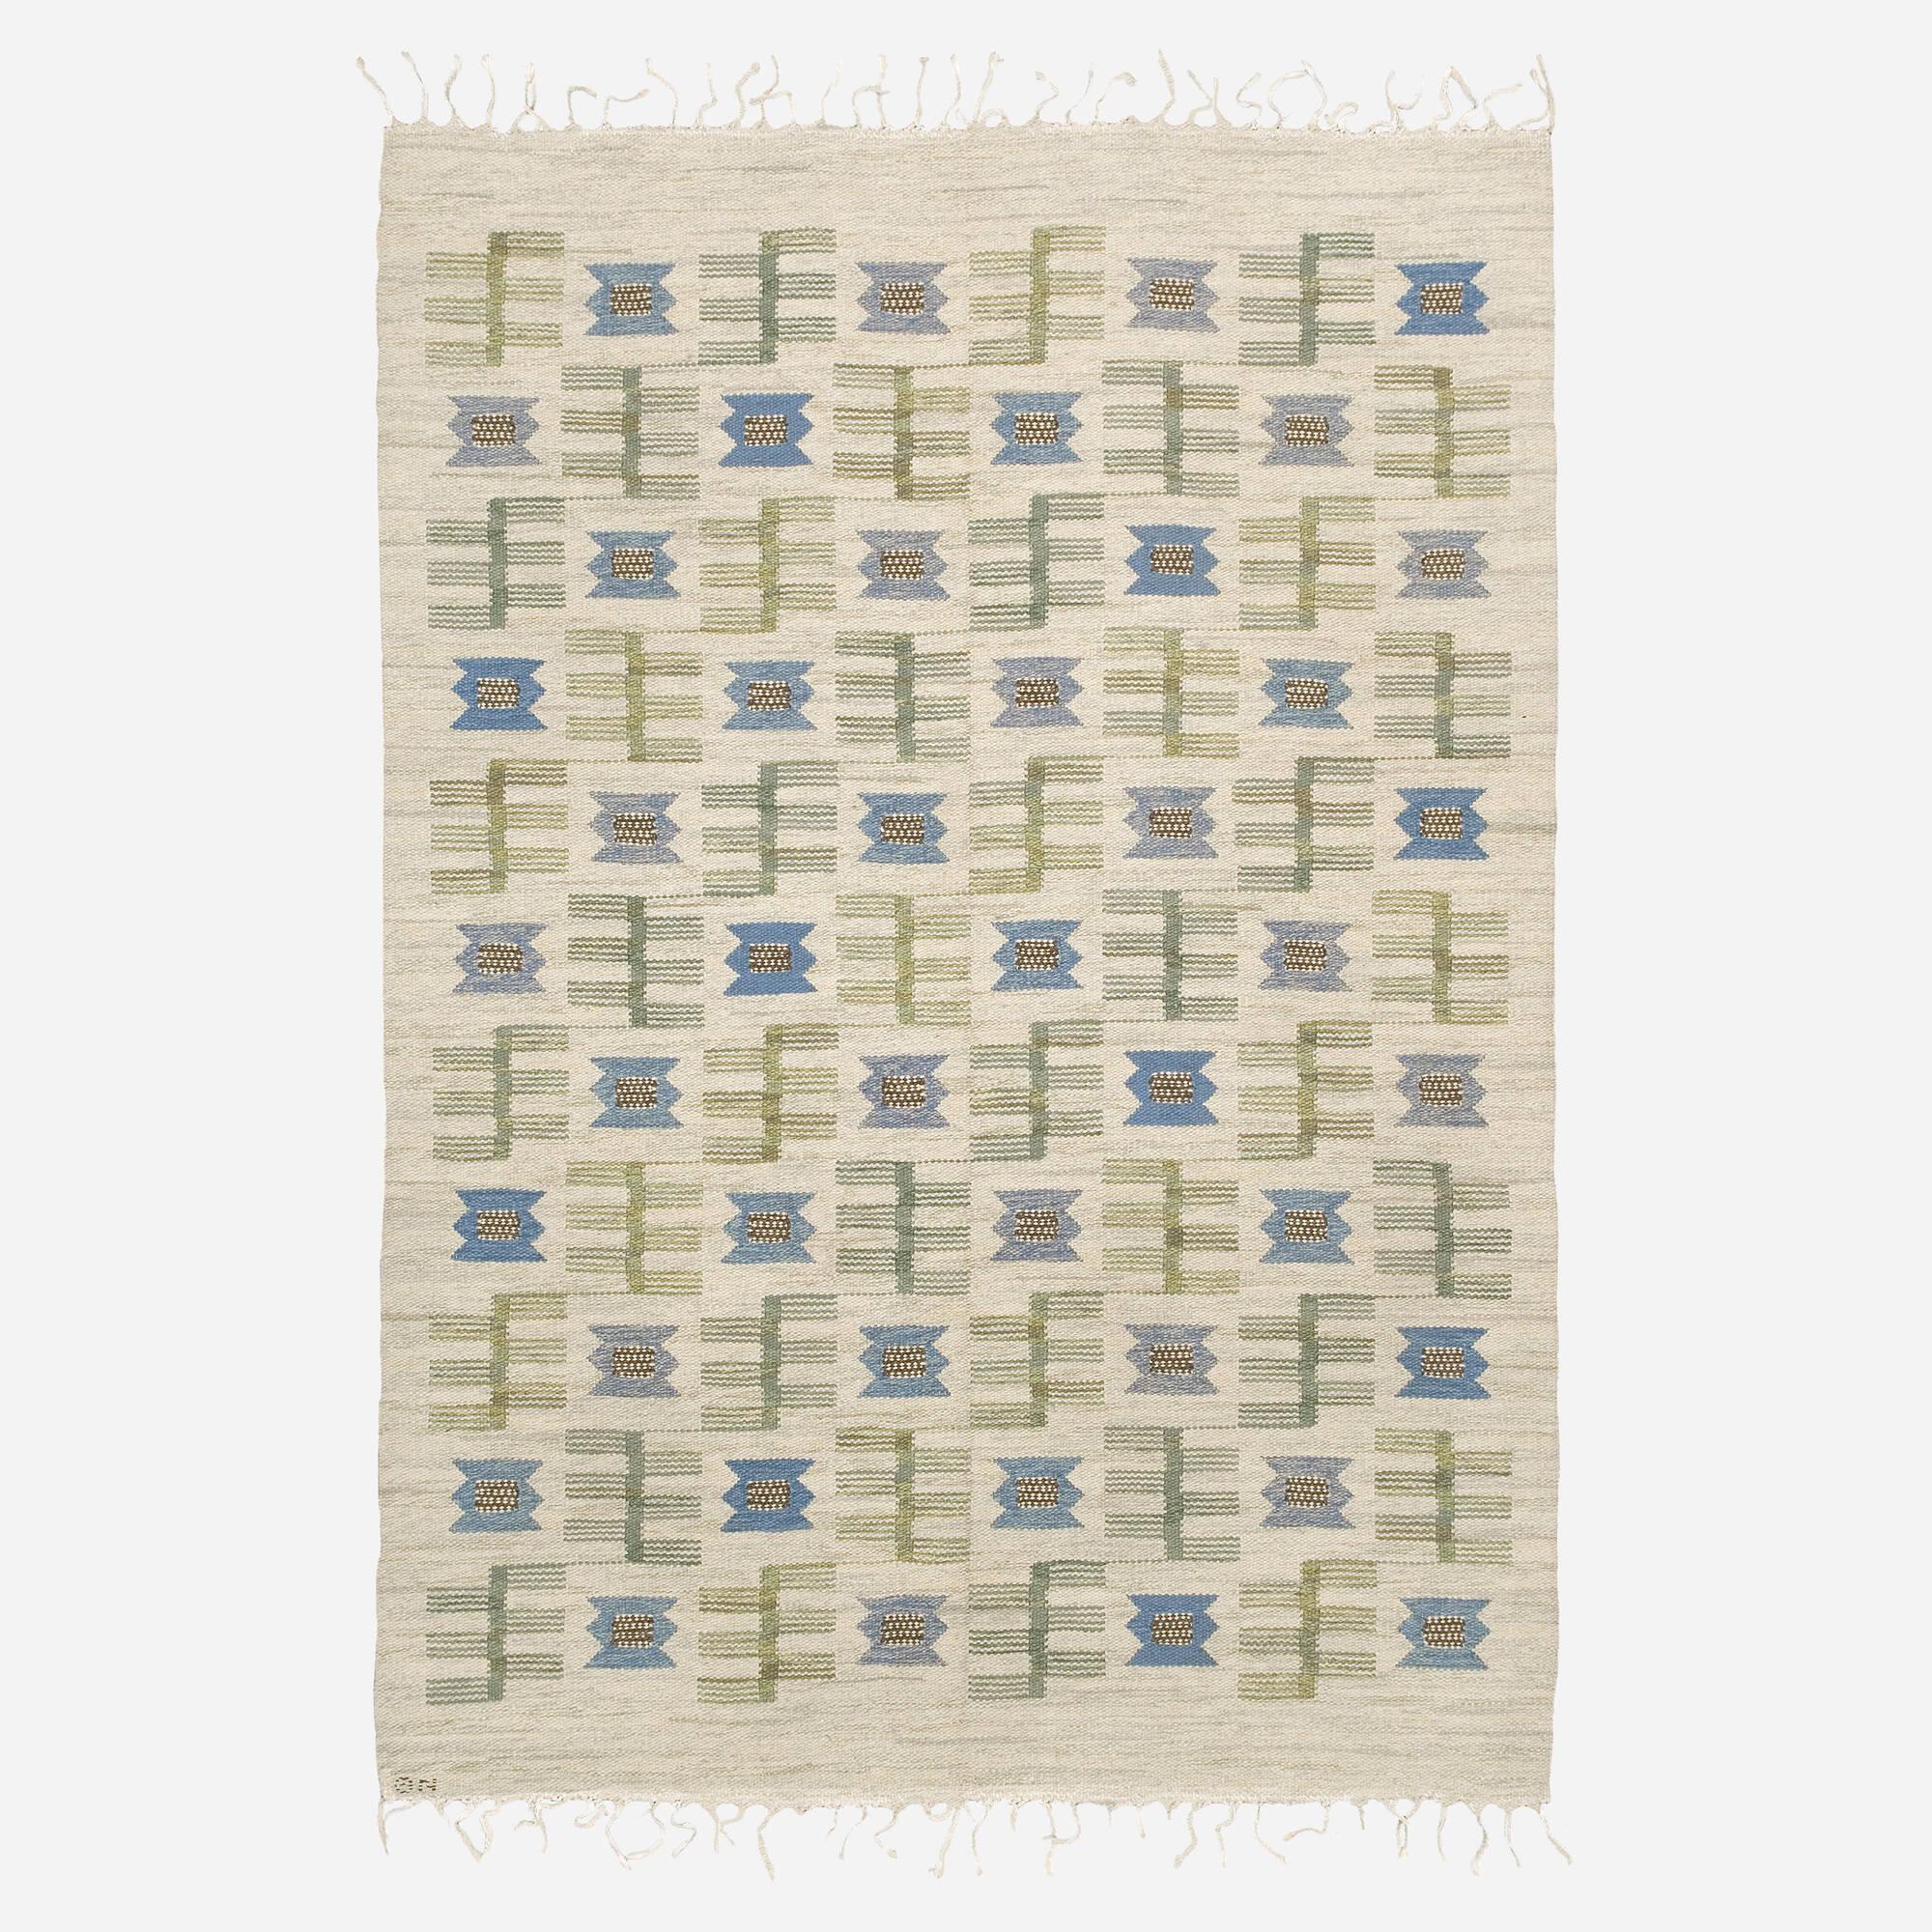 161: Scandinavian / flatweave carpet (1 of 1)